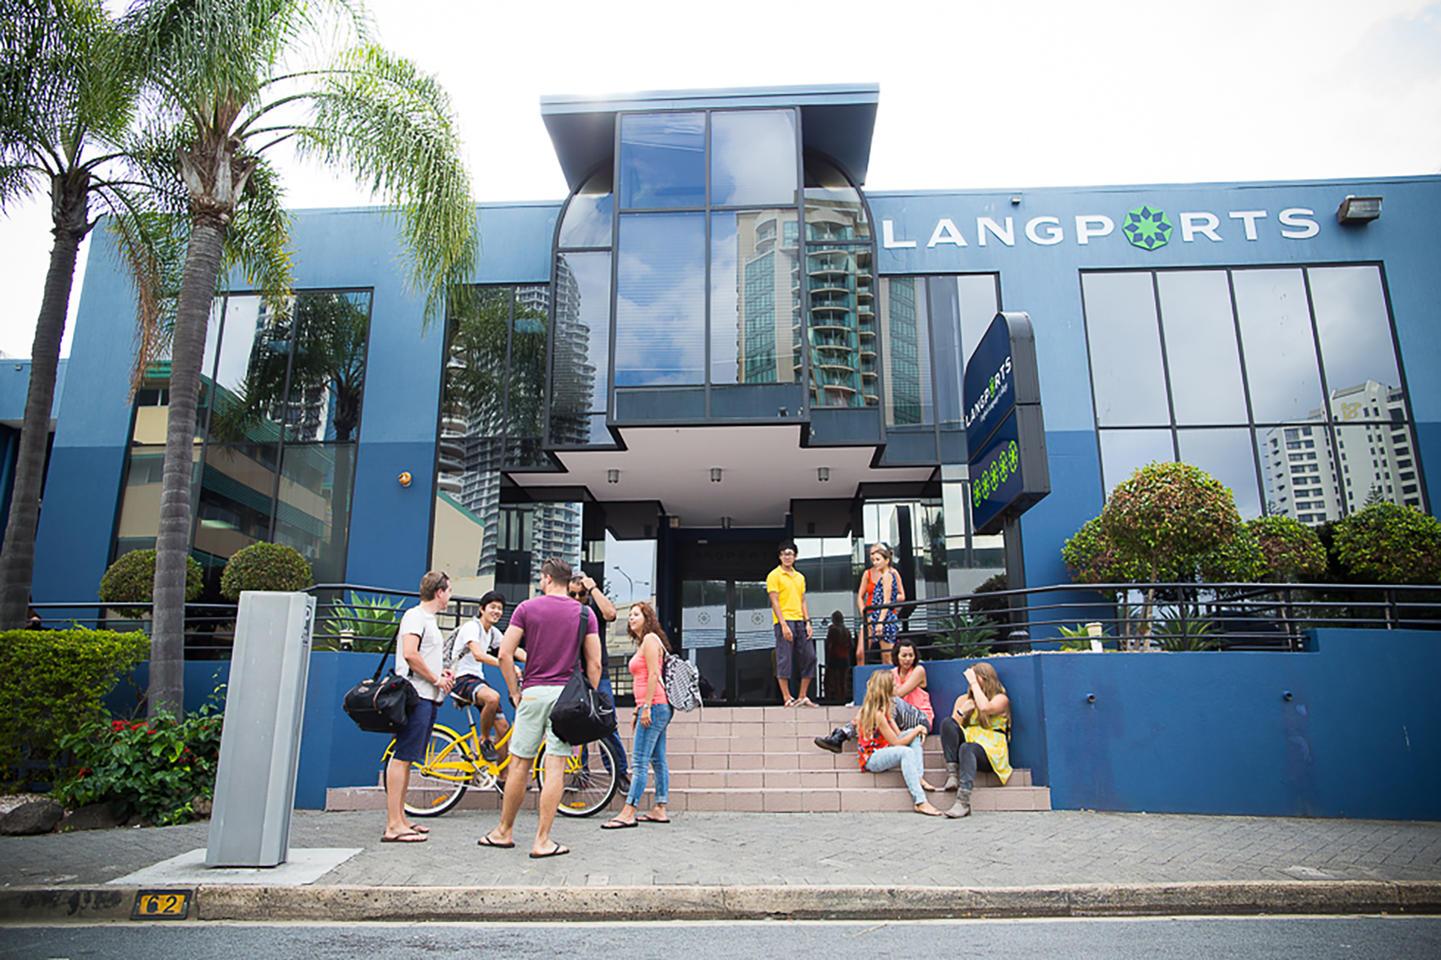 australien_gold-coast_langports_school-front-2